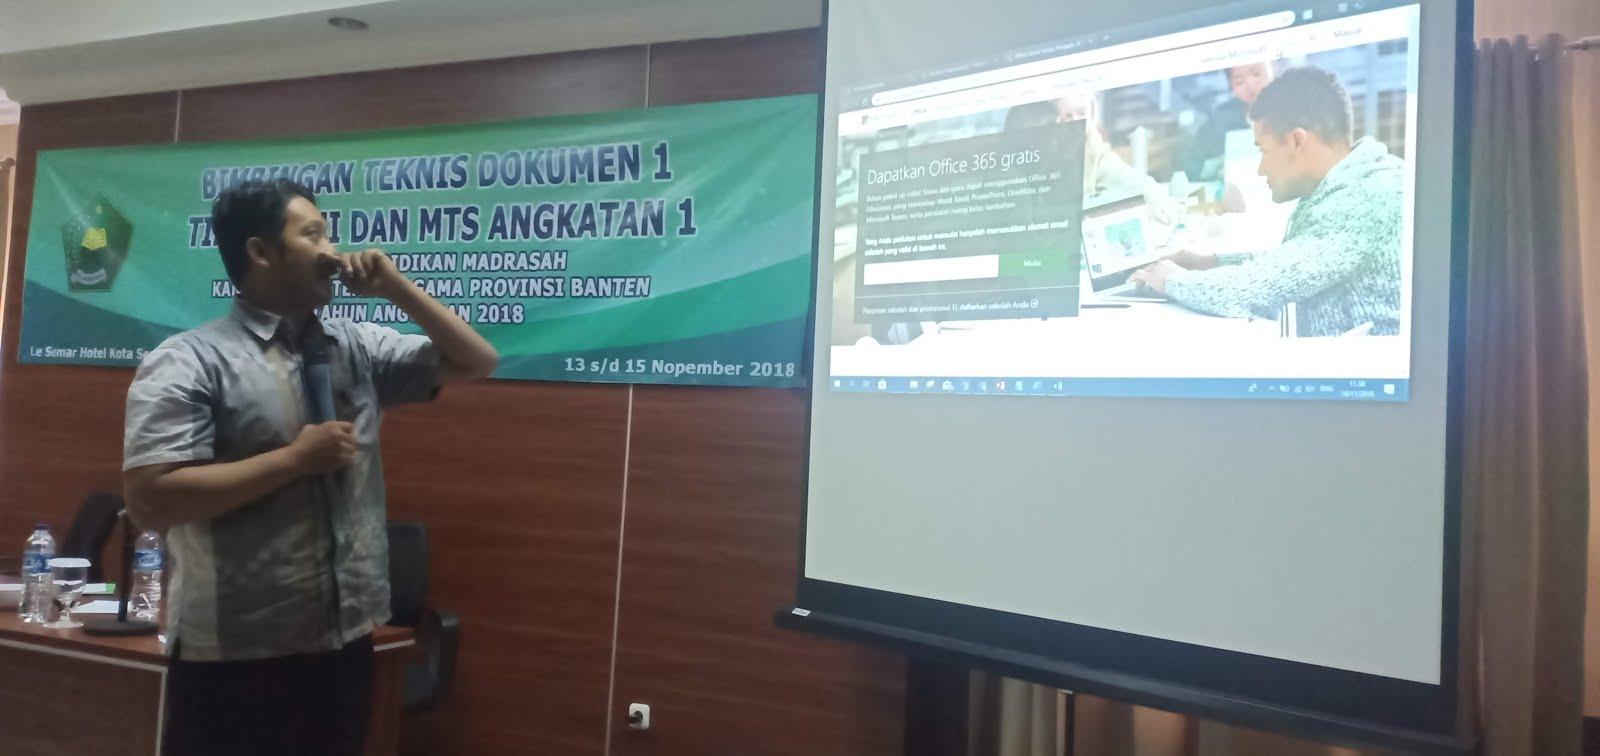 Workshop Office 365 Education, Serang